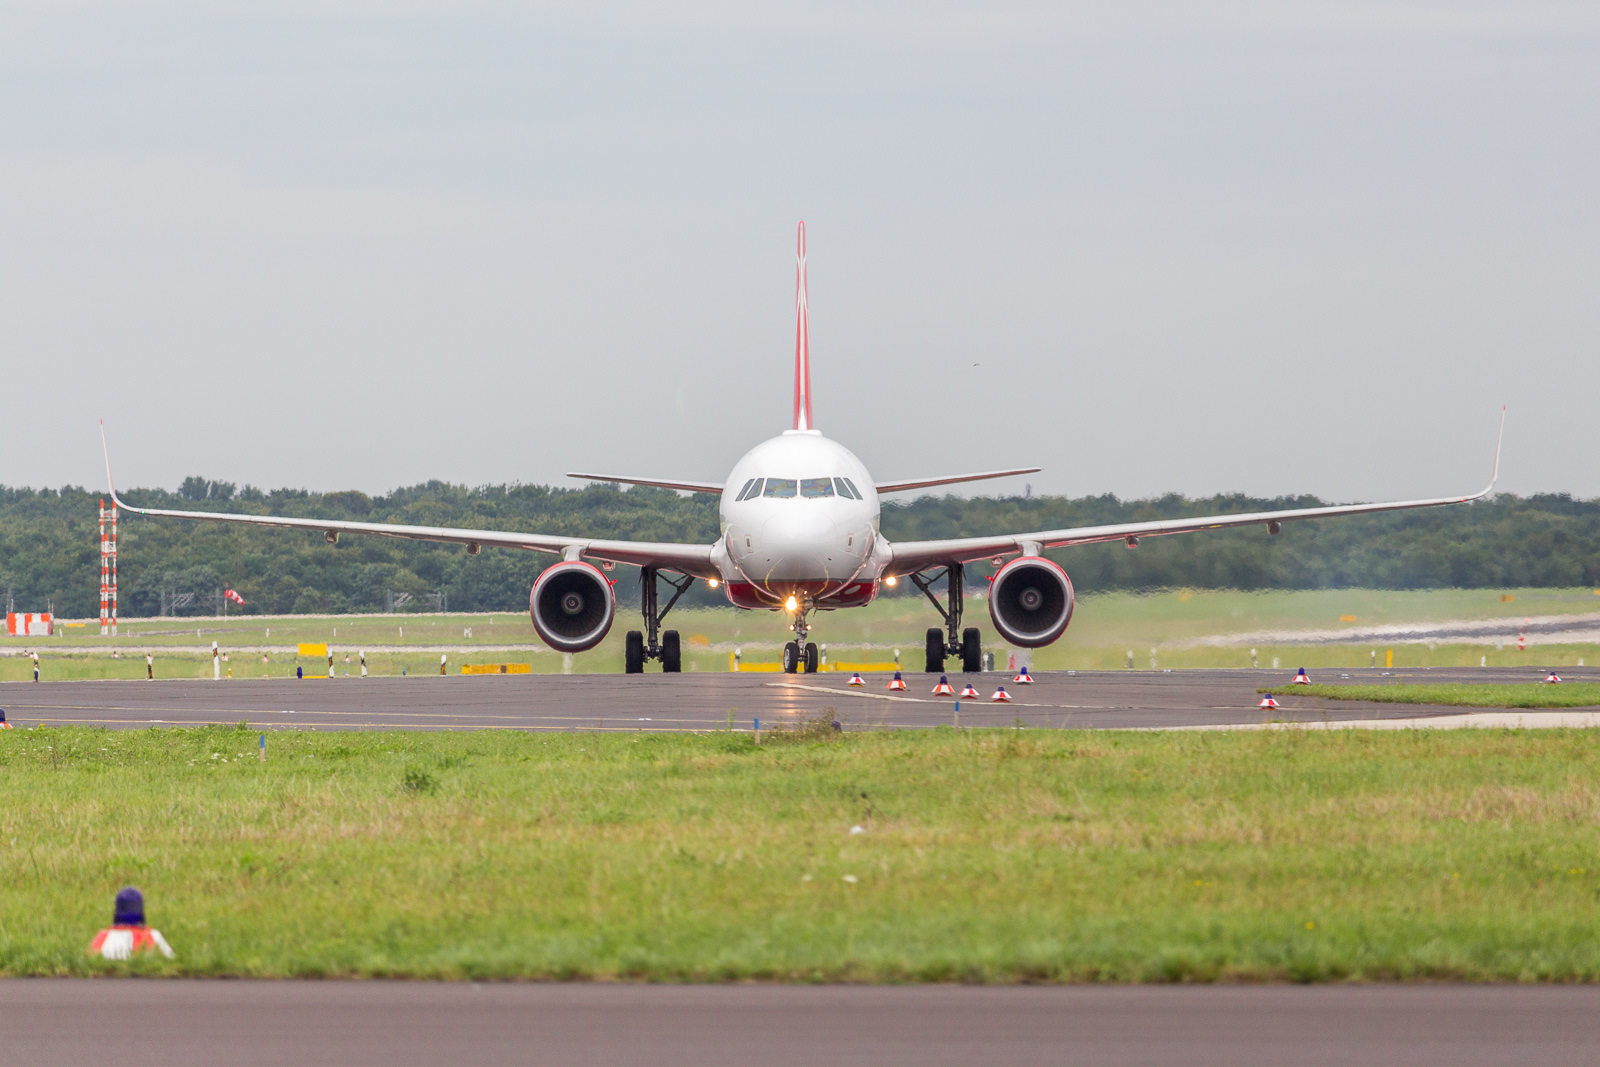 Flughafentour Düsseldorf DUS, Fototour